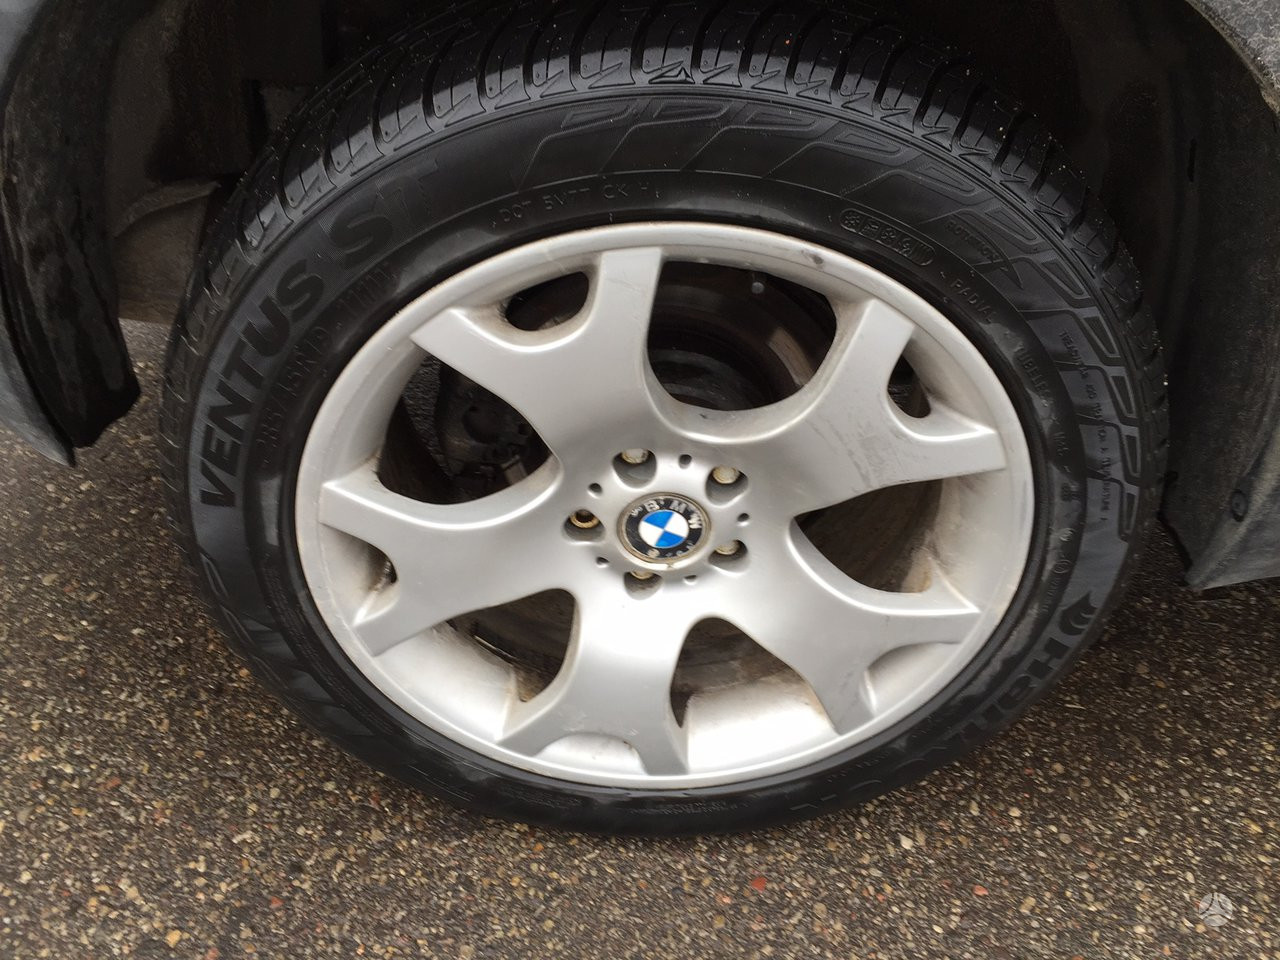 BMW X5 2003m Orginalūs Ratlankiai  99 € / vnt